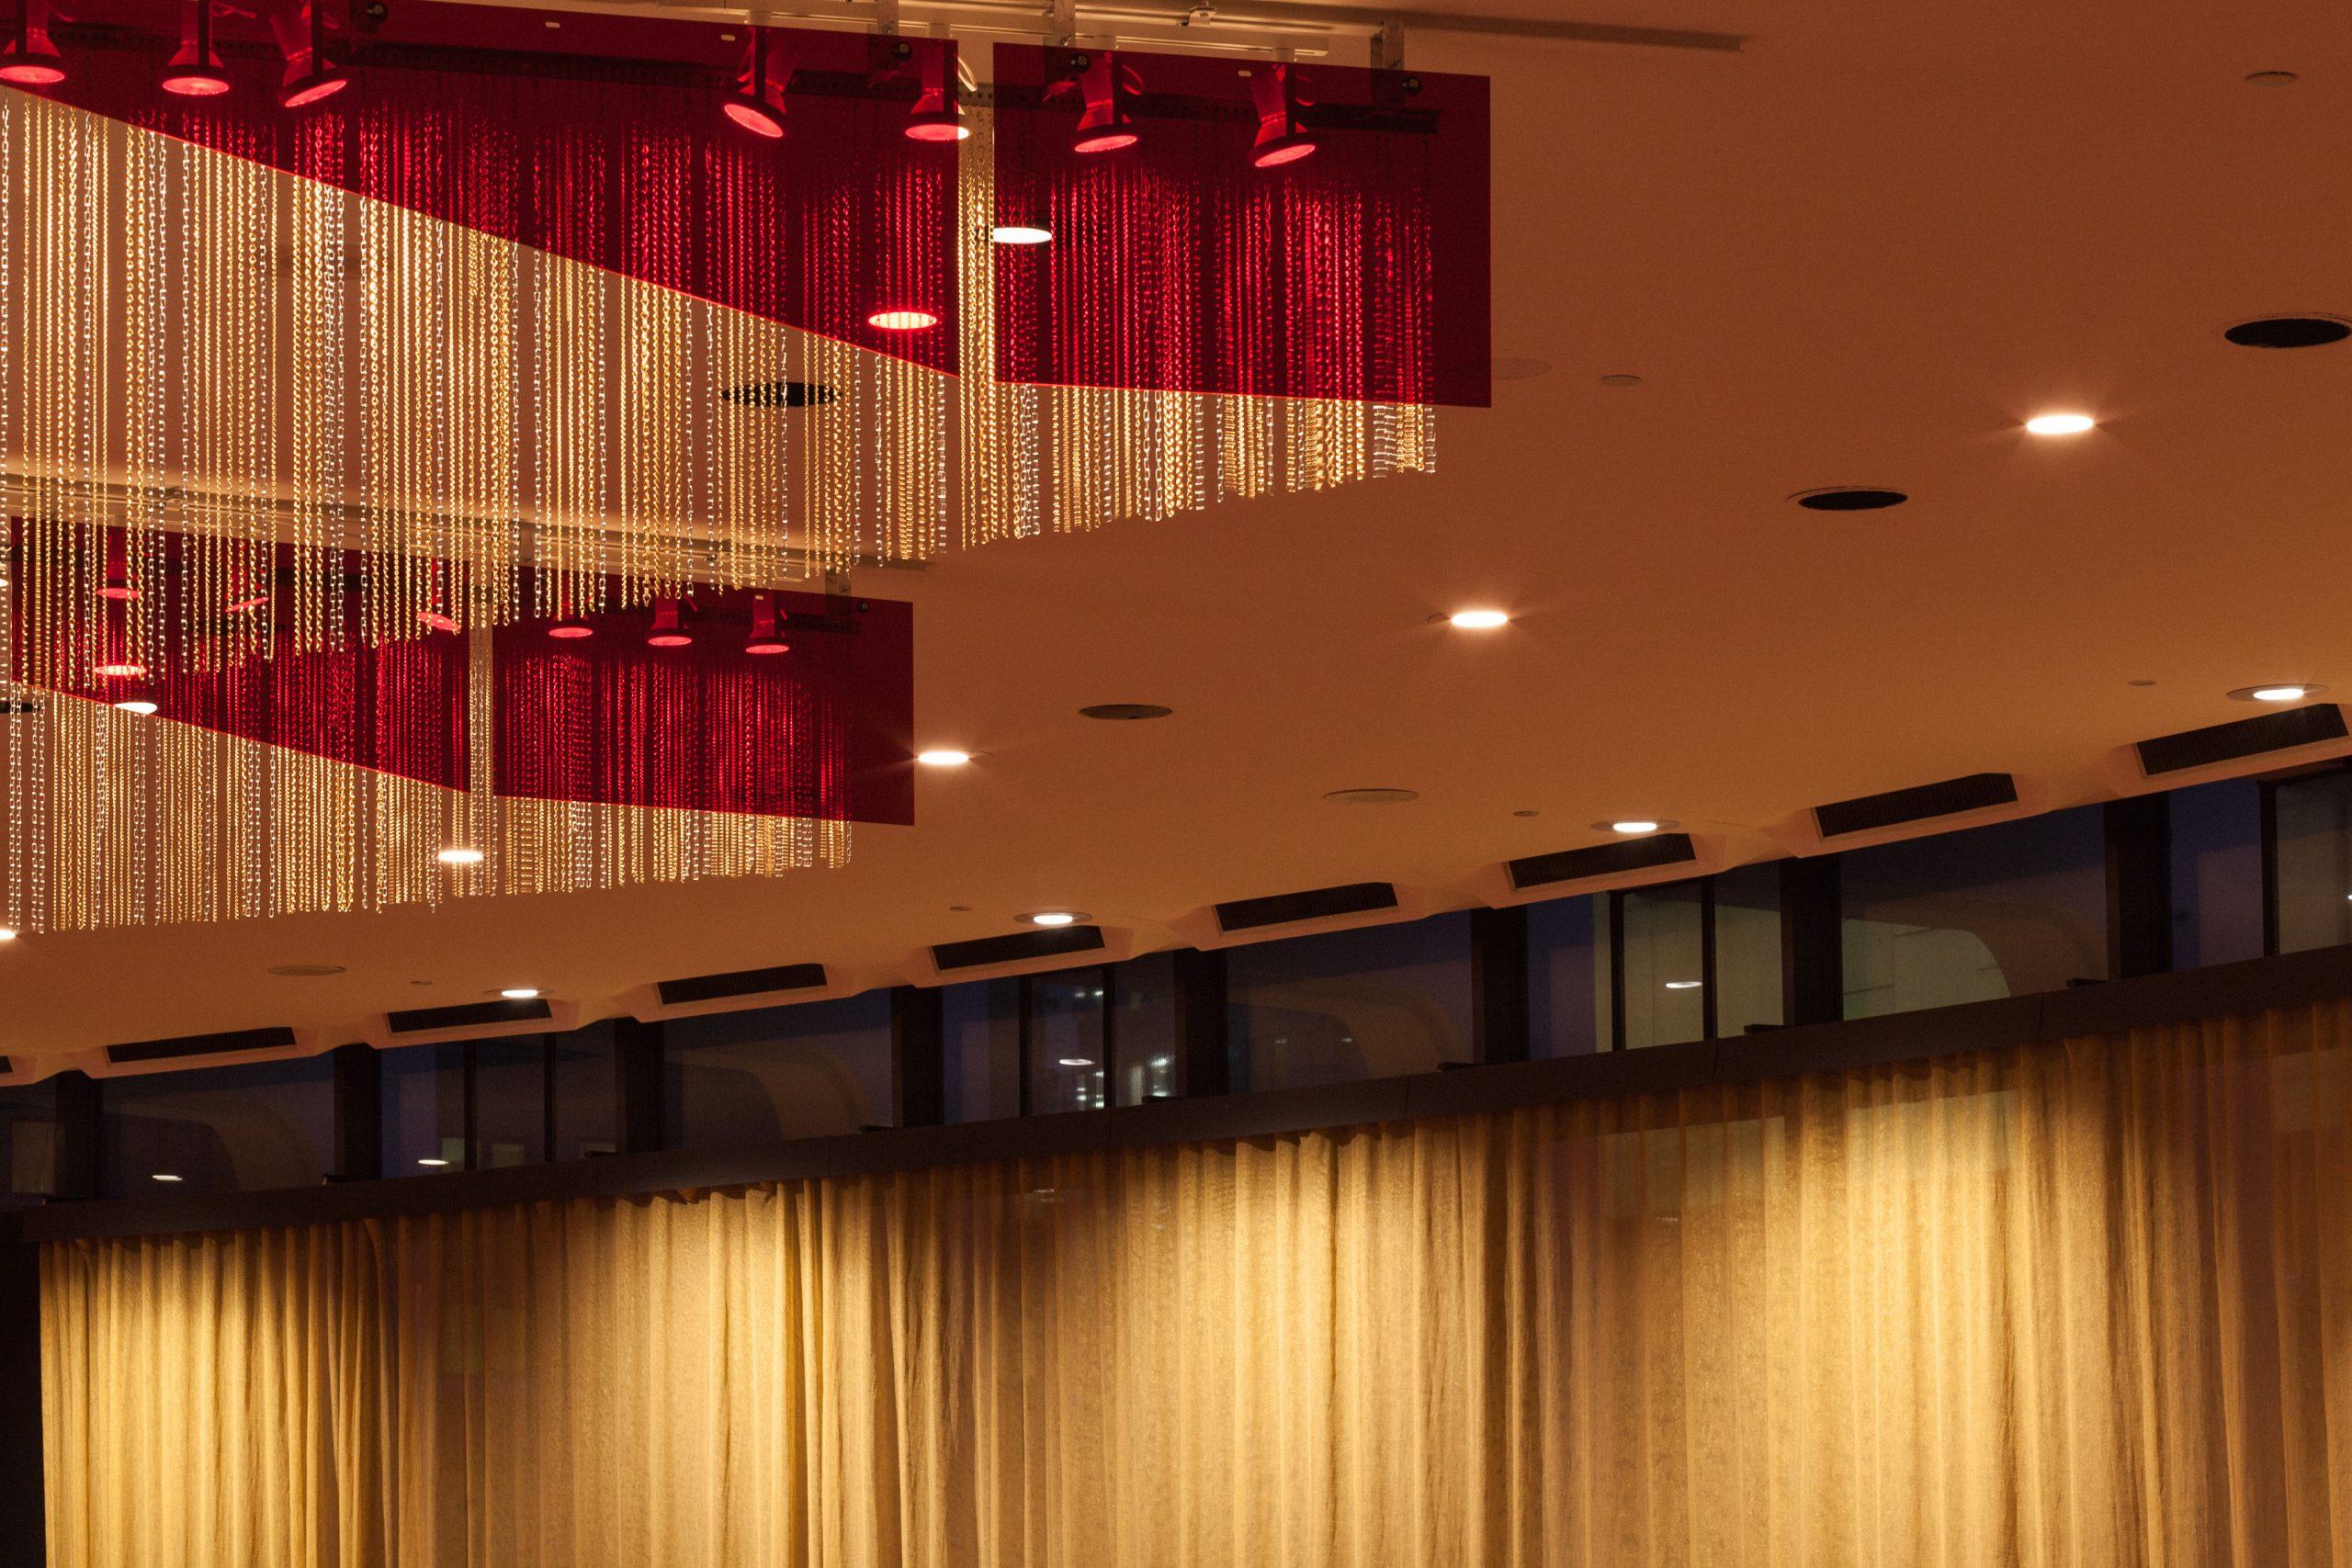 Opalescente Fiction, 21 sculptural chandeliers